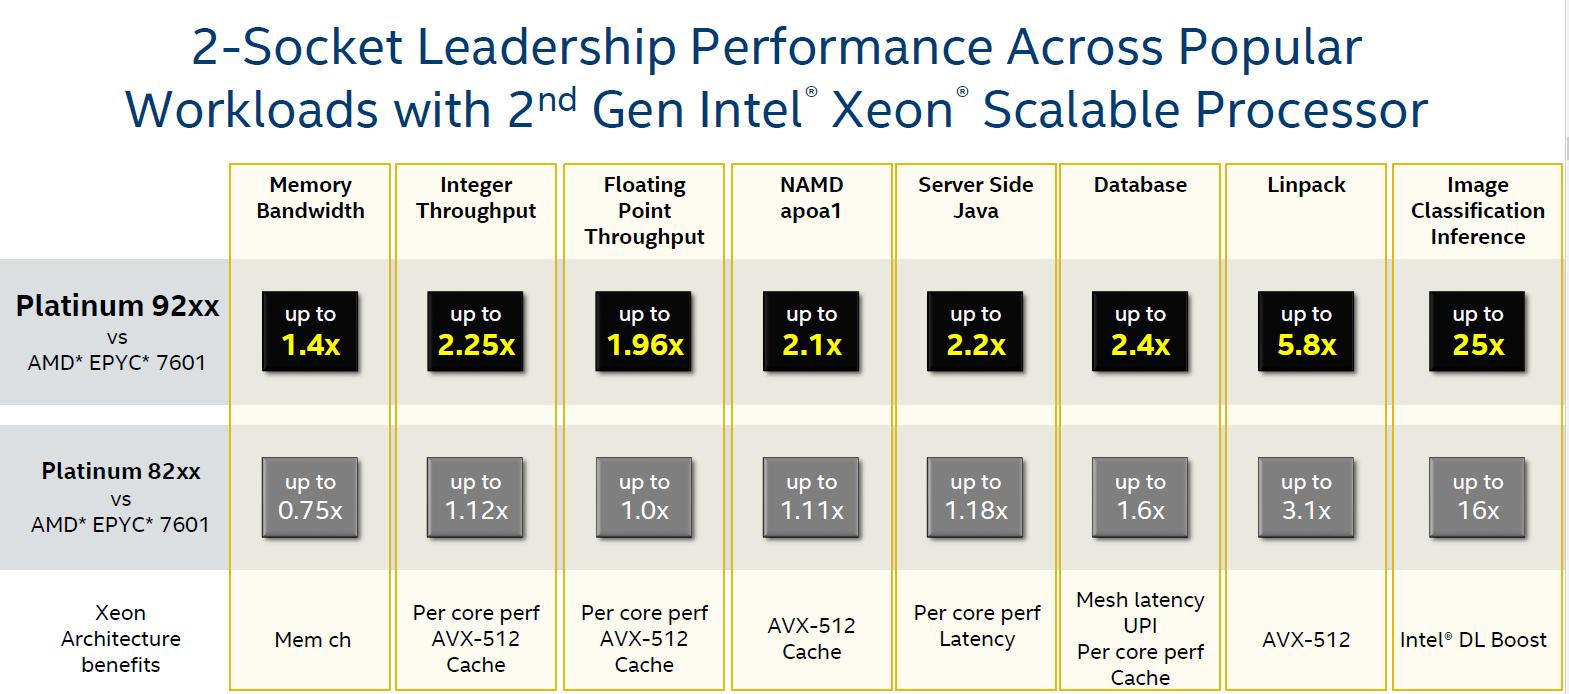 CPU Performance: Intel's Own Claims - Intel's Xeon Cascade